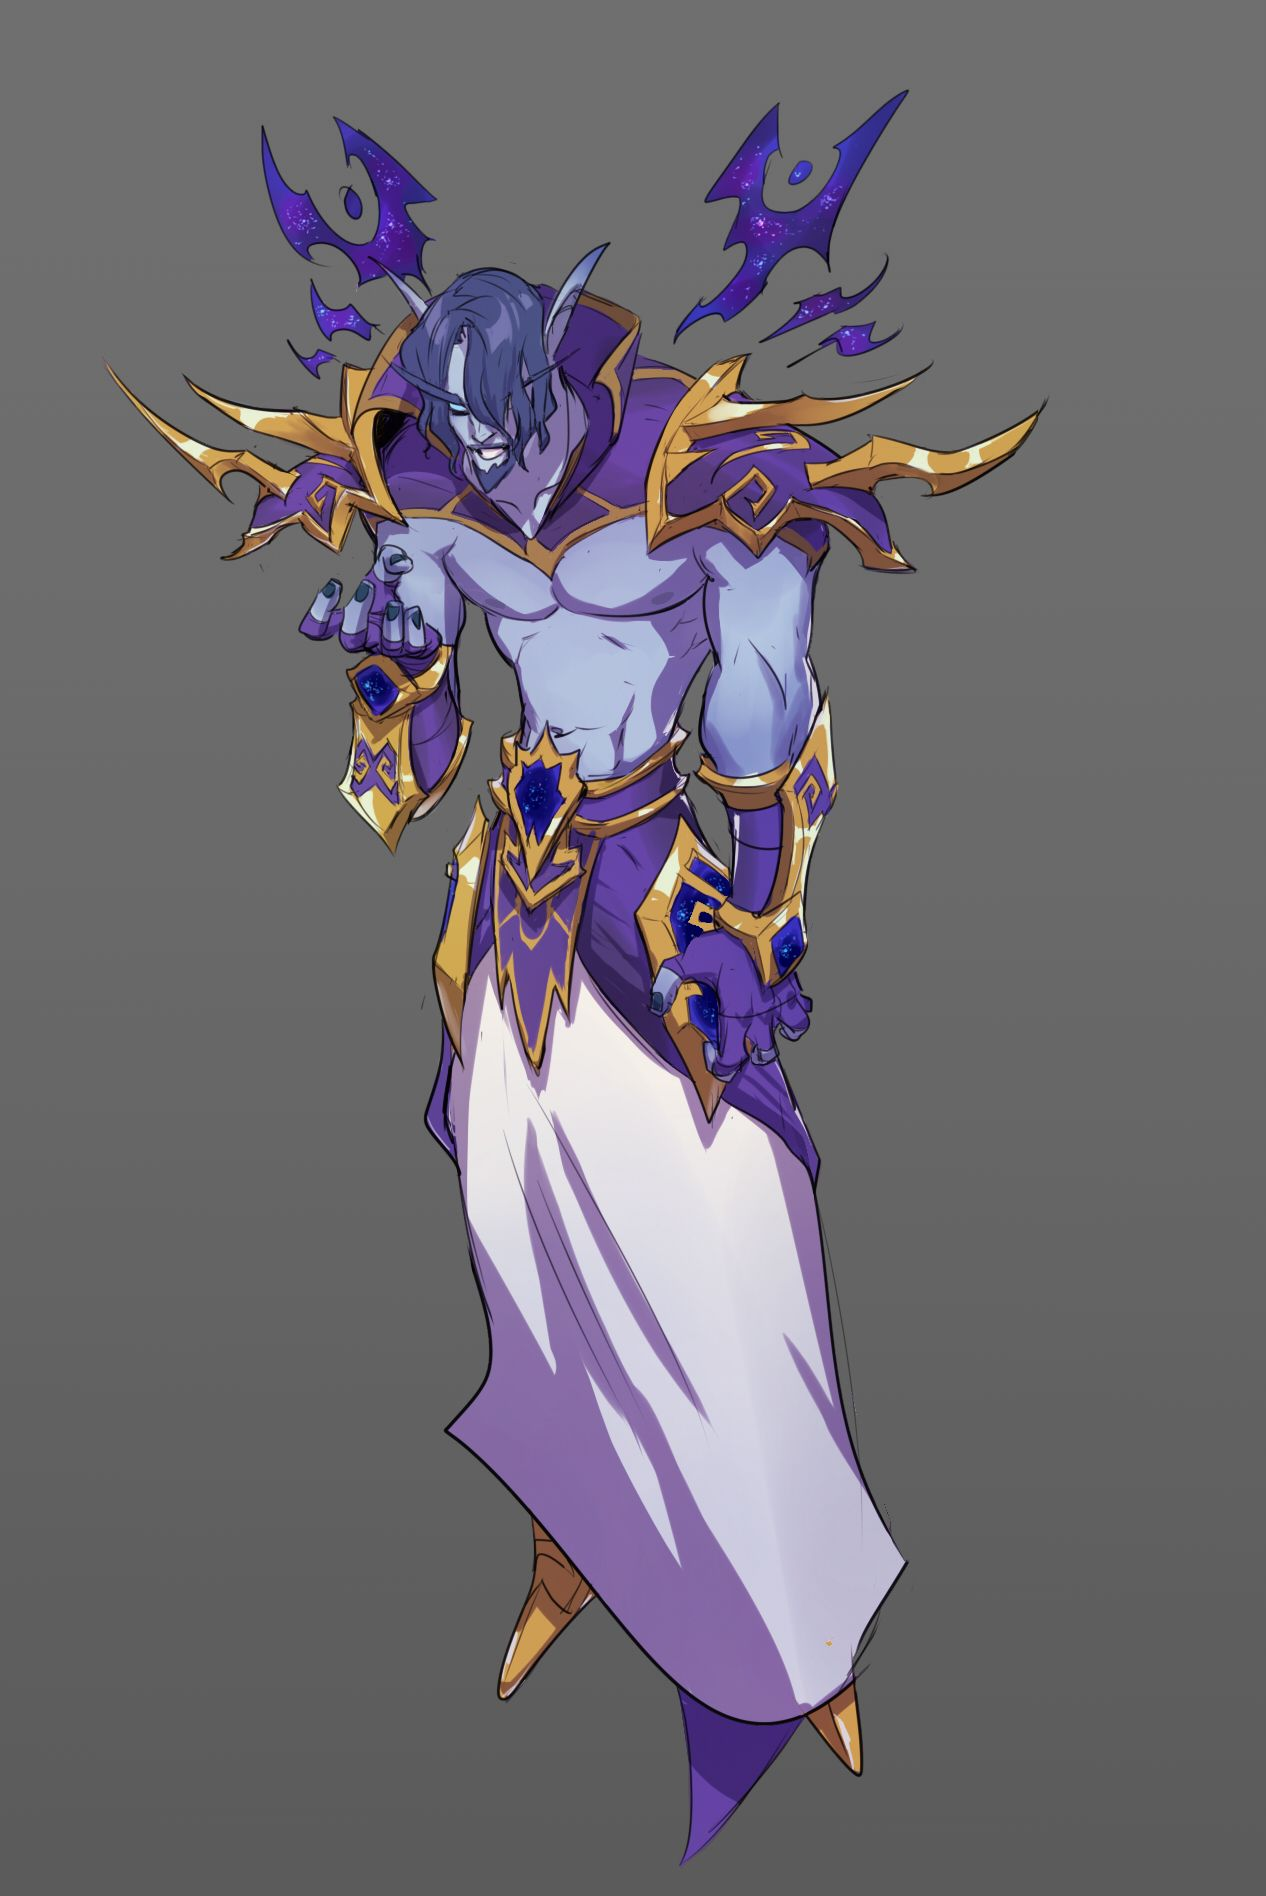 Wow Void Elf Shadow Priest By Silsol On Deviantart World Of Warcraft Warcraft Art World Of Warcraft Paladin #worldofwarcraft #blizzard #hearthstone #wow #warcraft #blizzardcs #gaming. pinterest